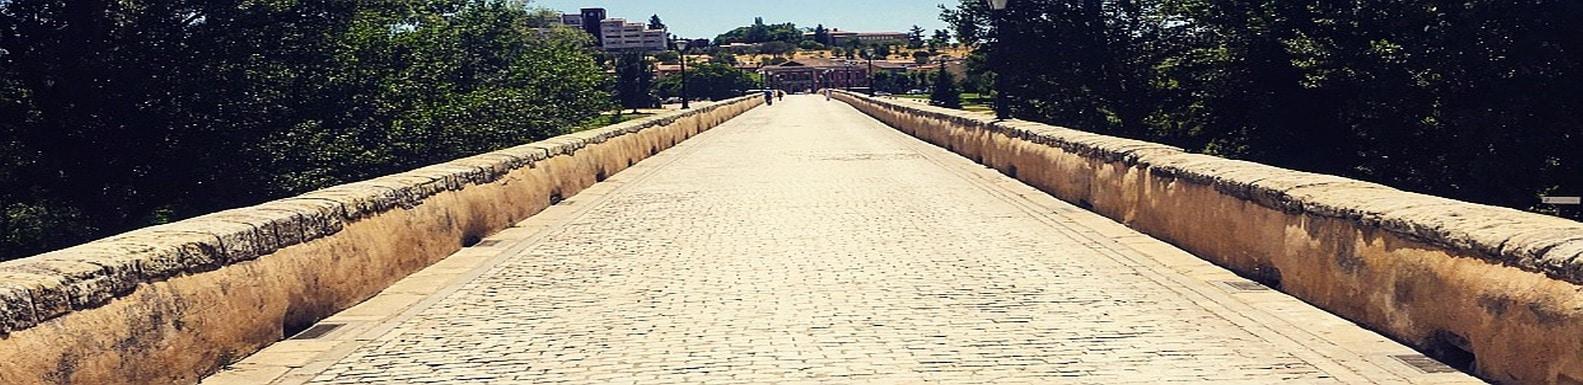 bridge_blog